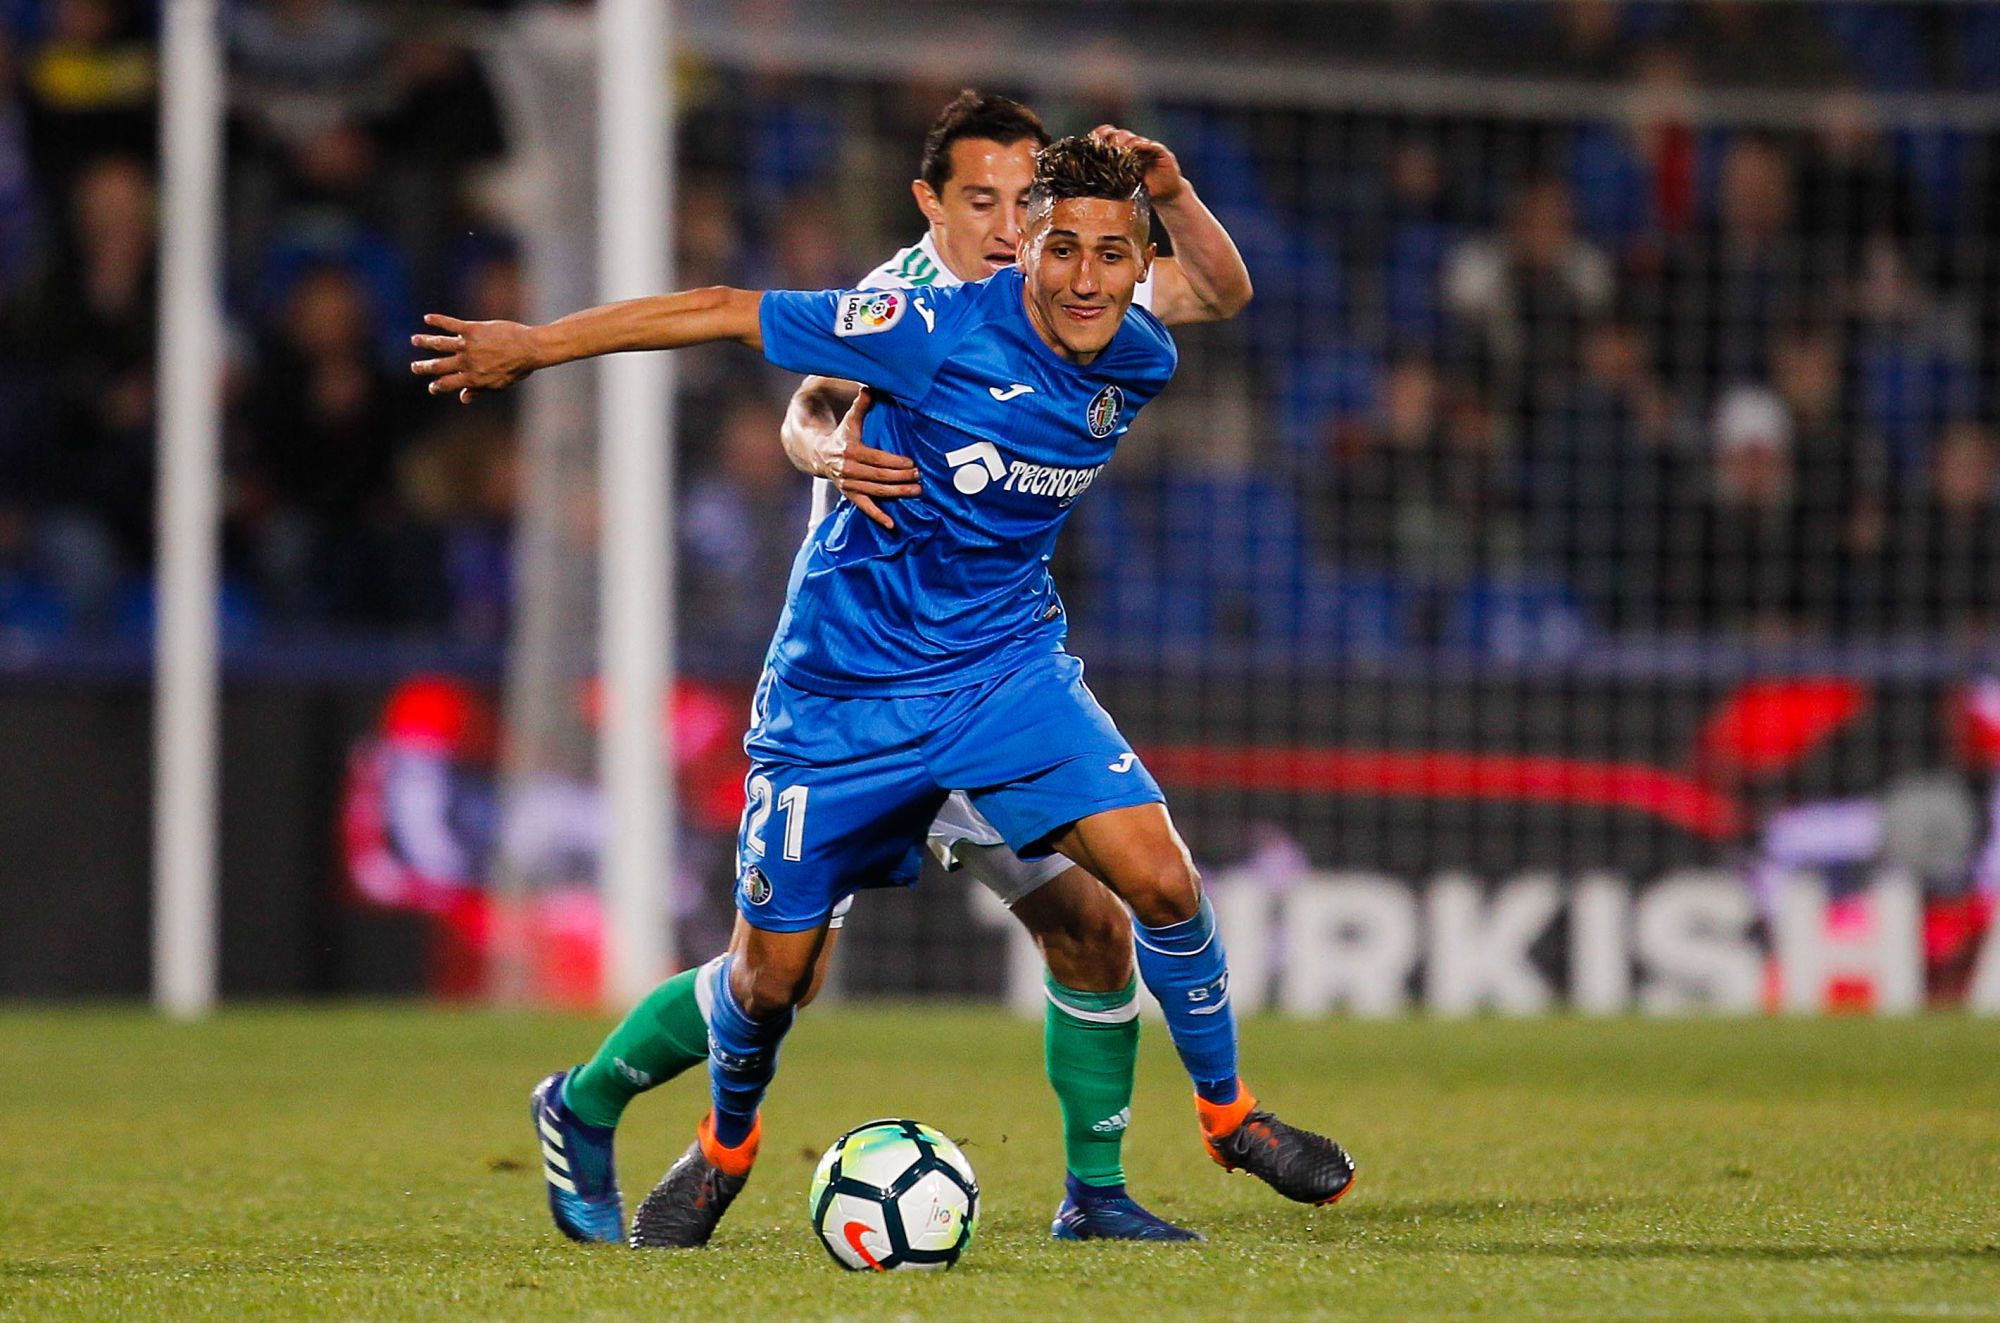 Fayçal Fajr de retour au Stade Malherbe